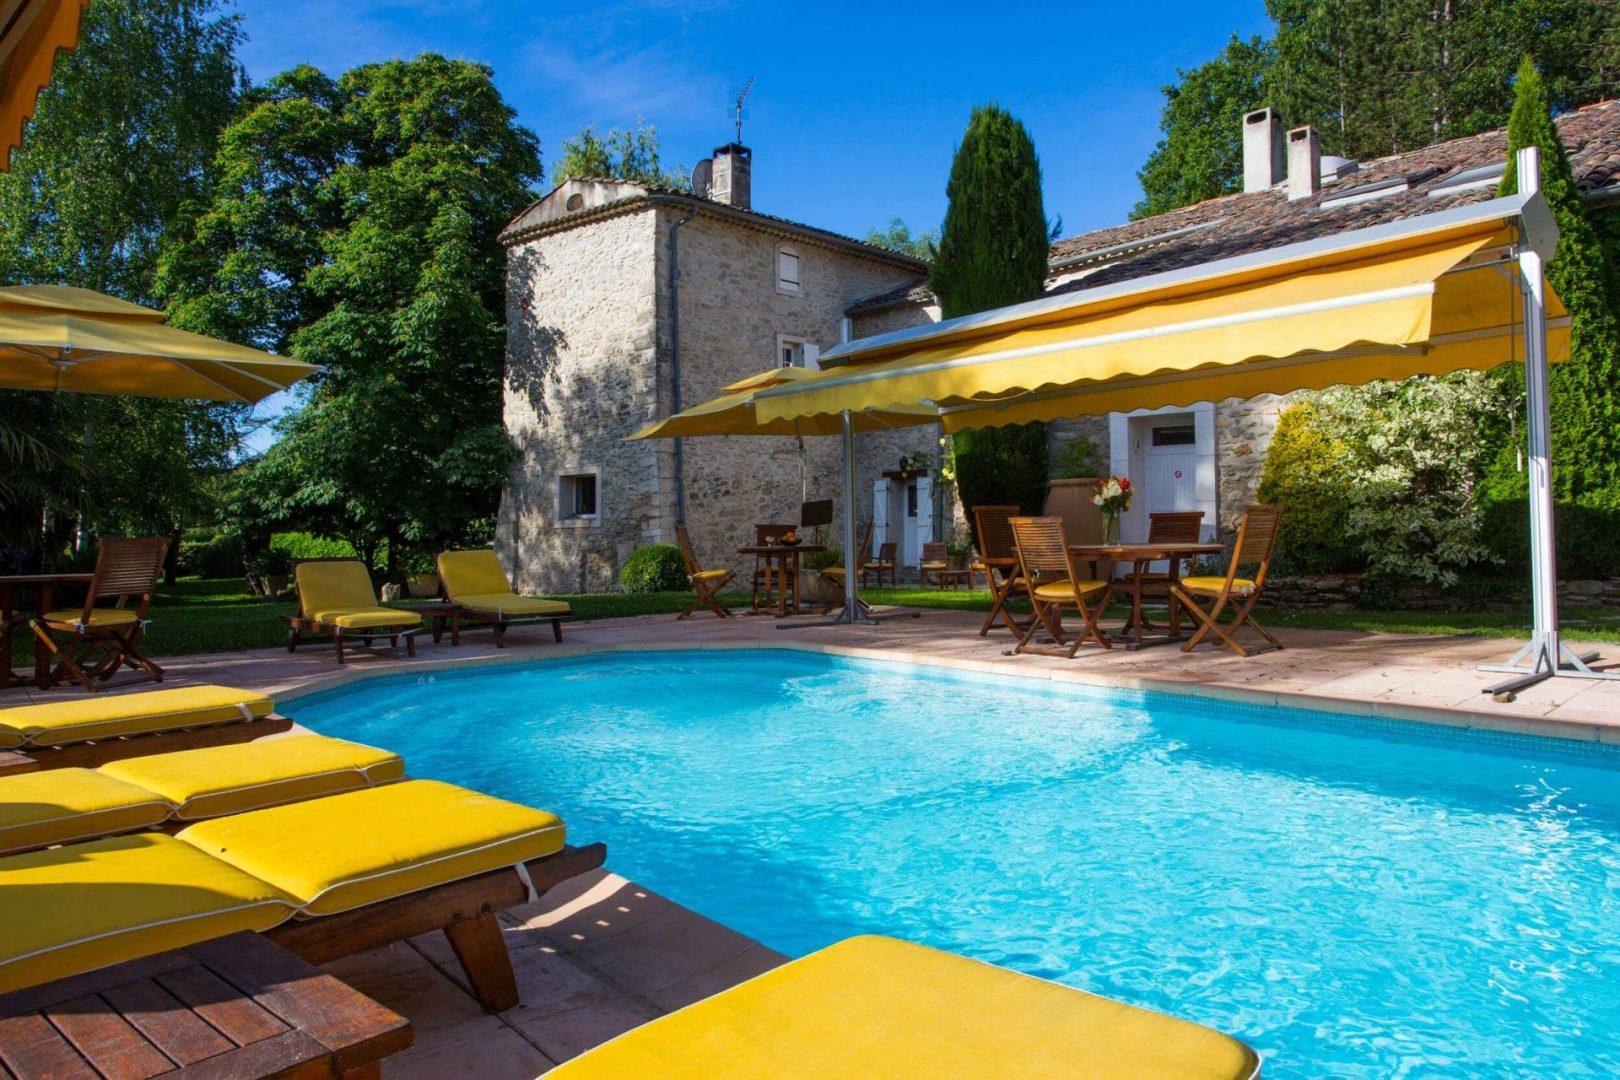 Campagne St Lazare mobilier terrasse piscine